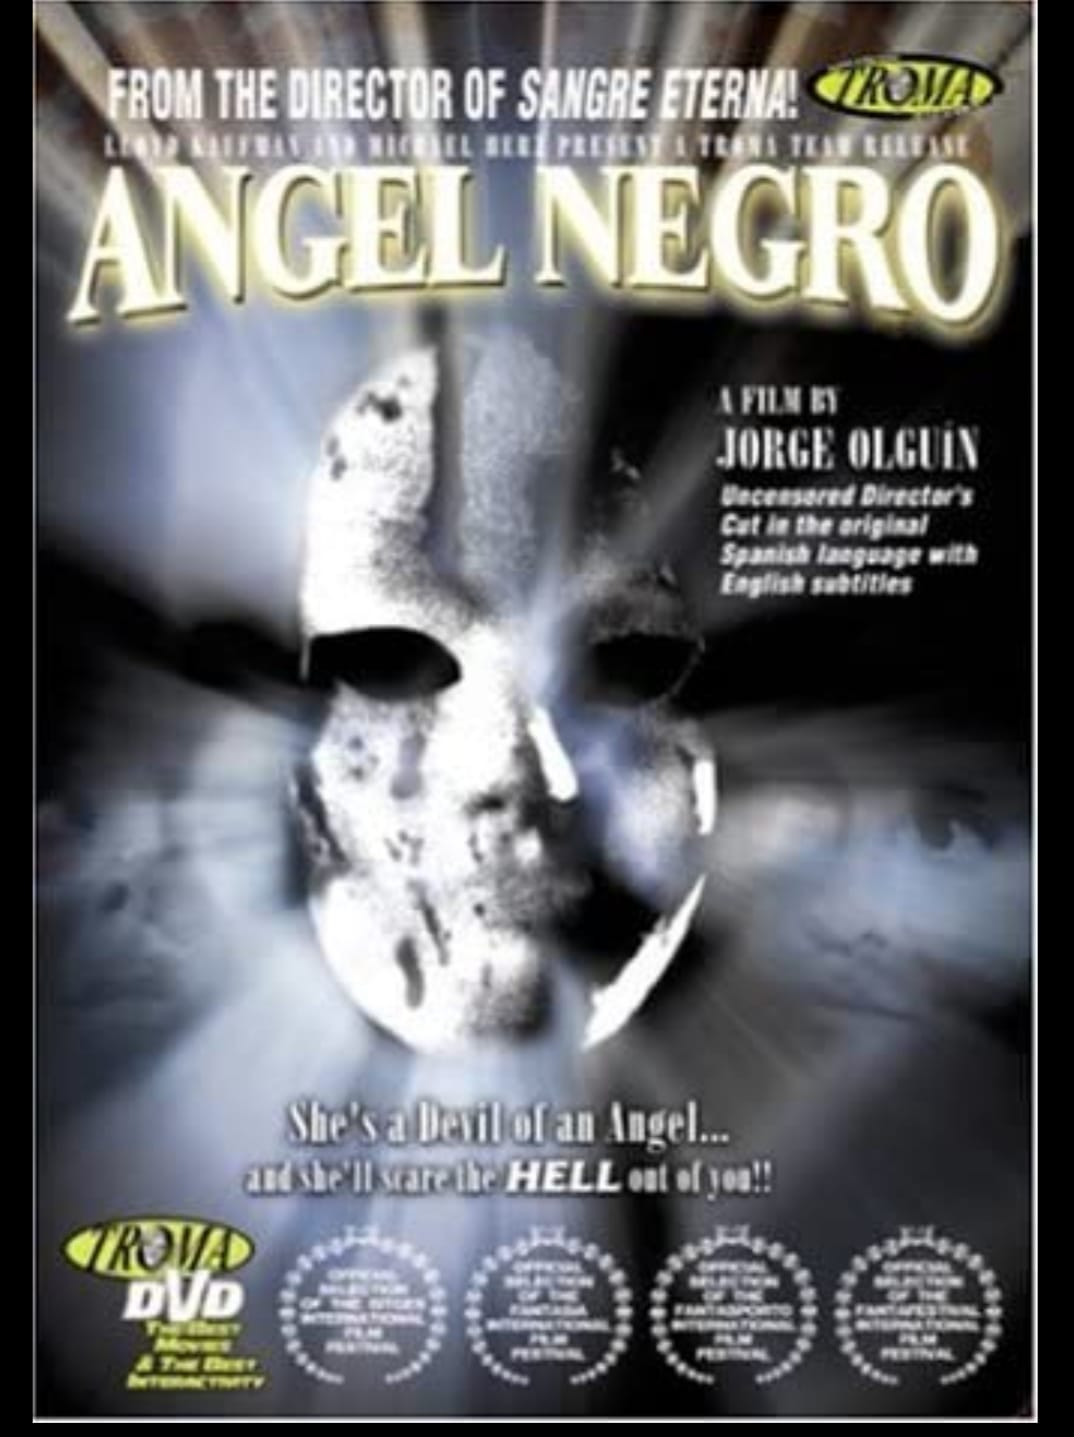 Angel negro (Film)